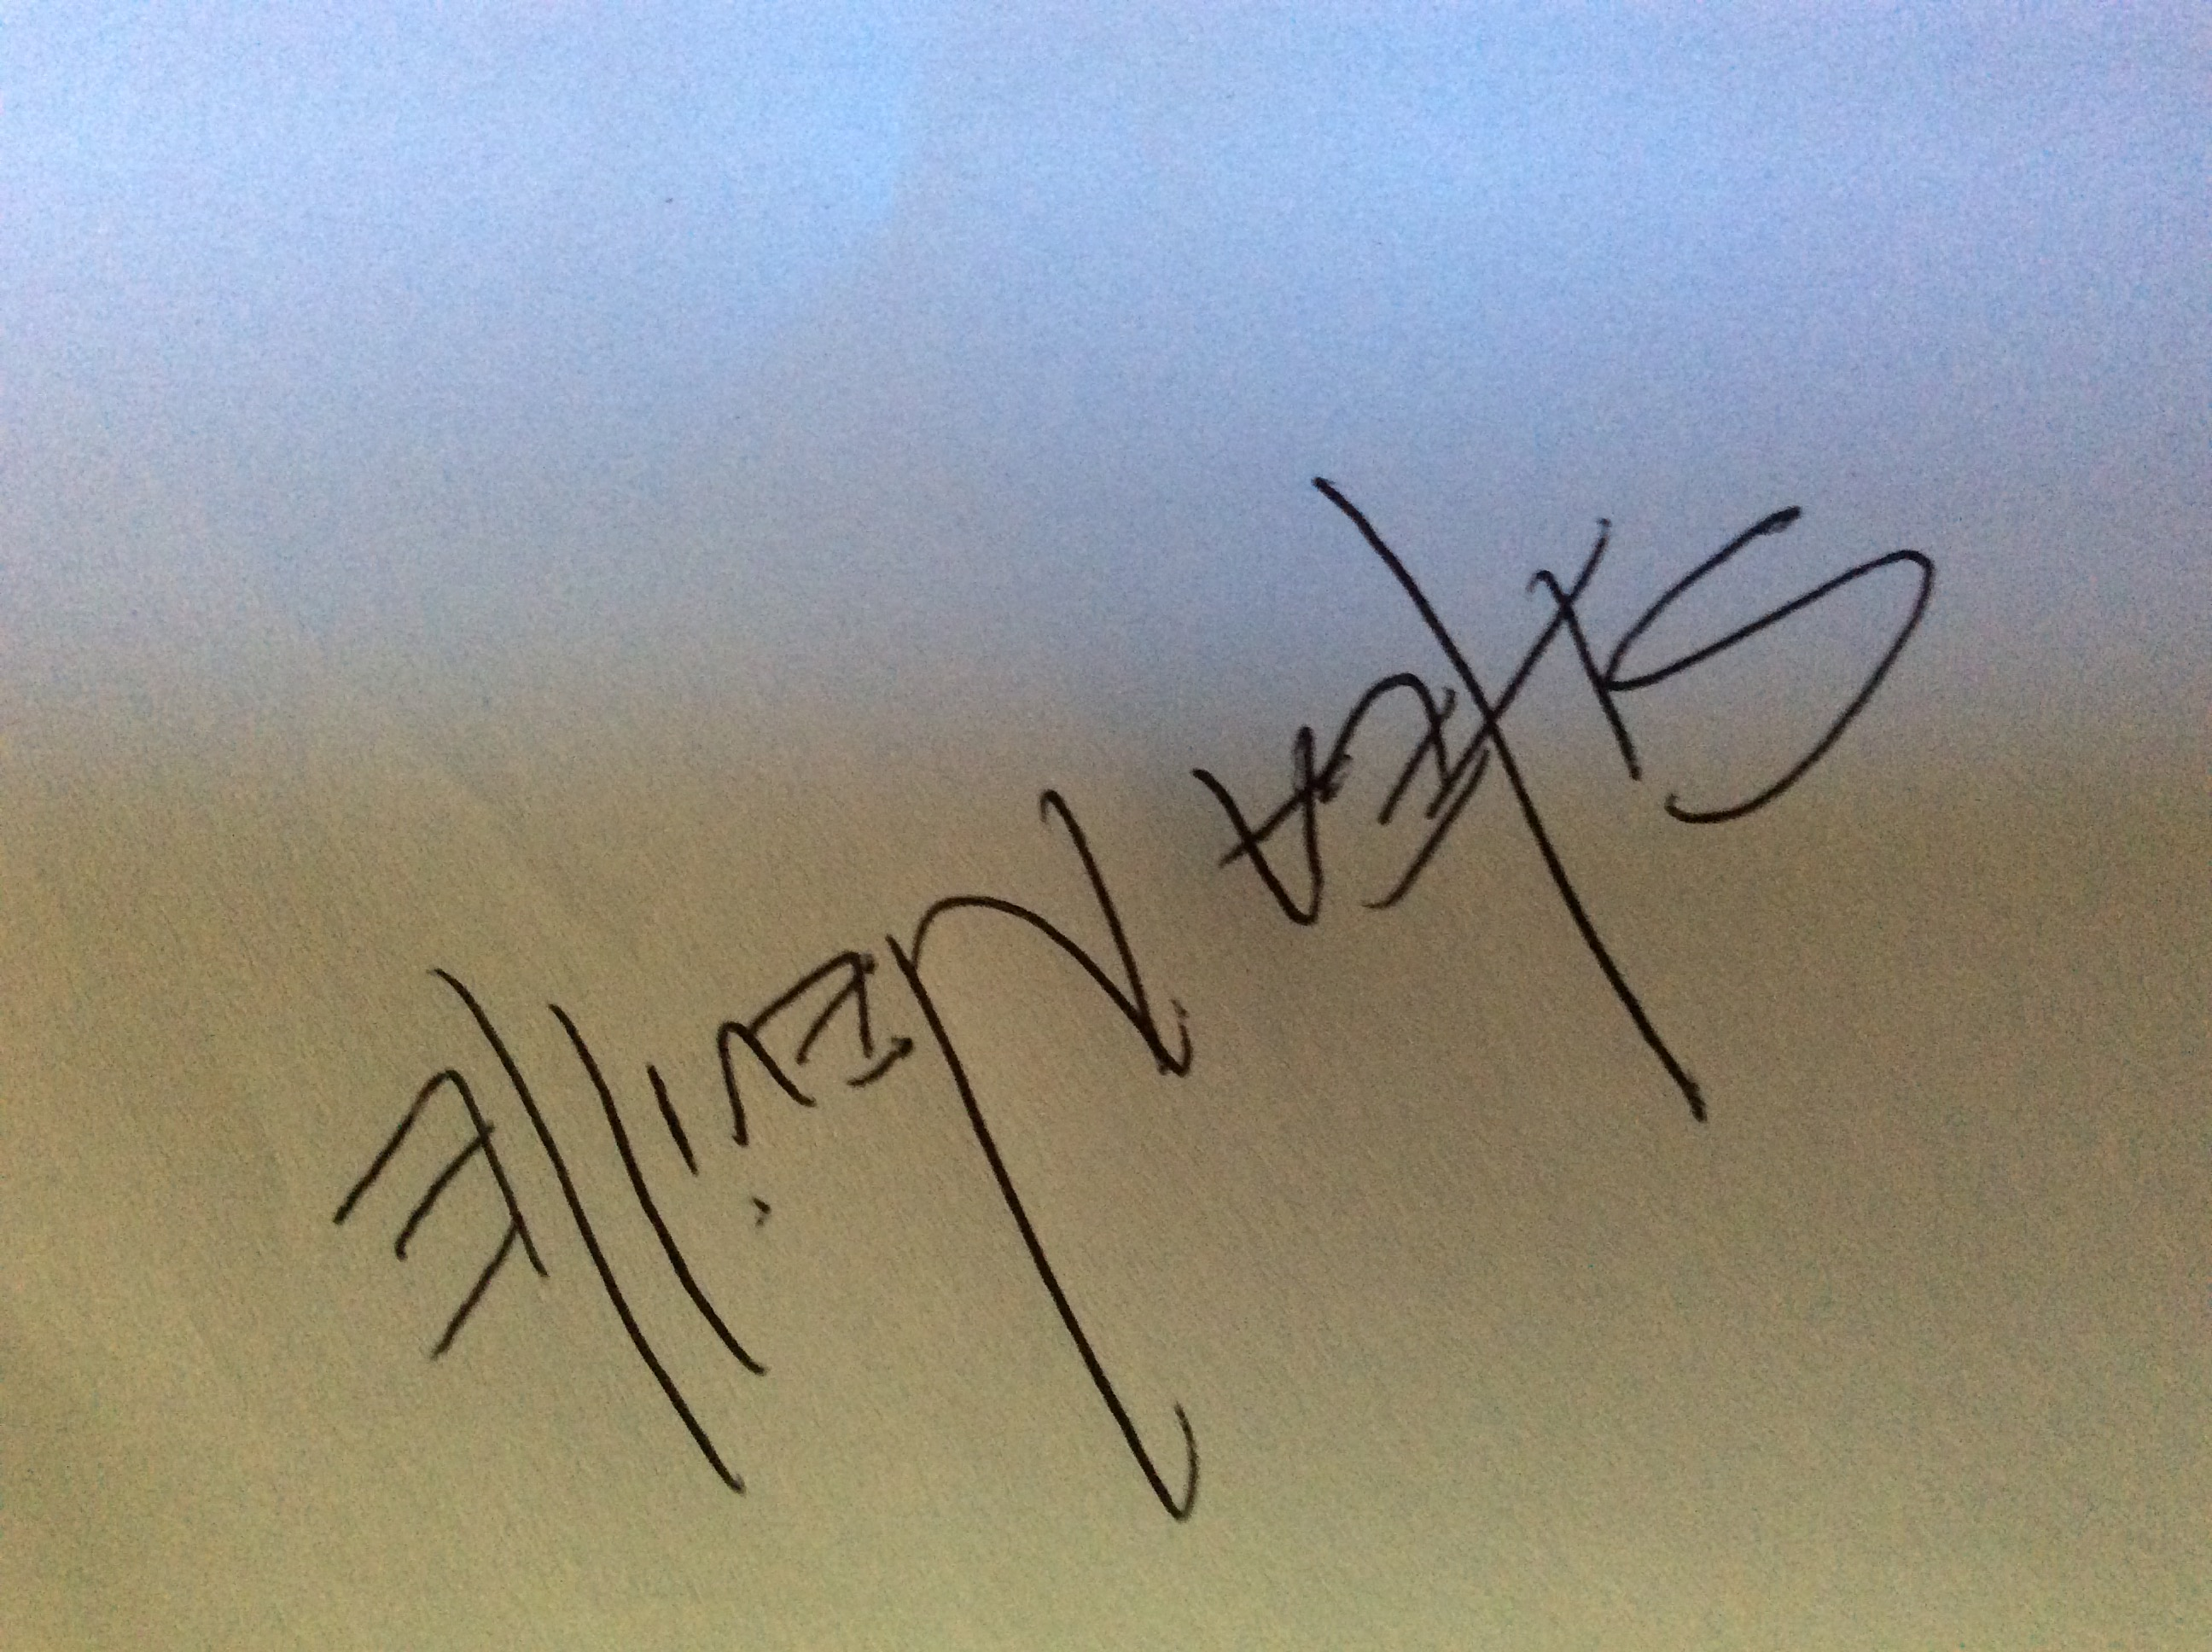 Shea Neville's Signature